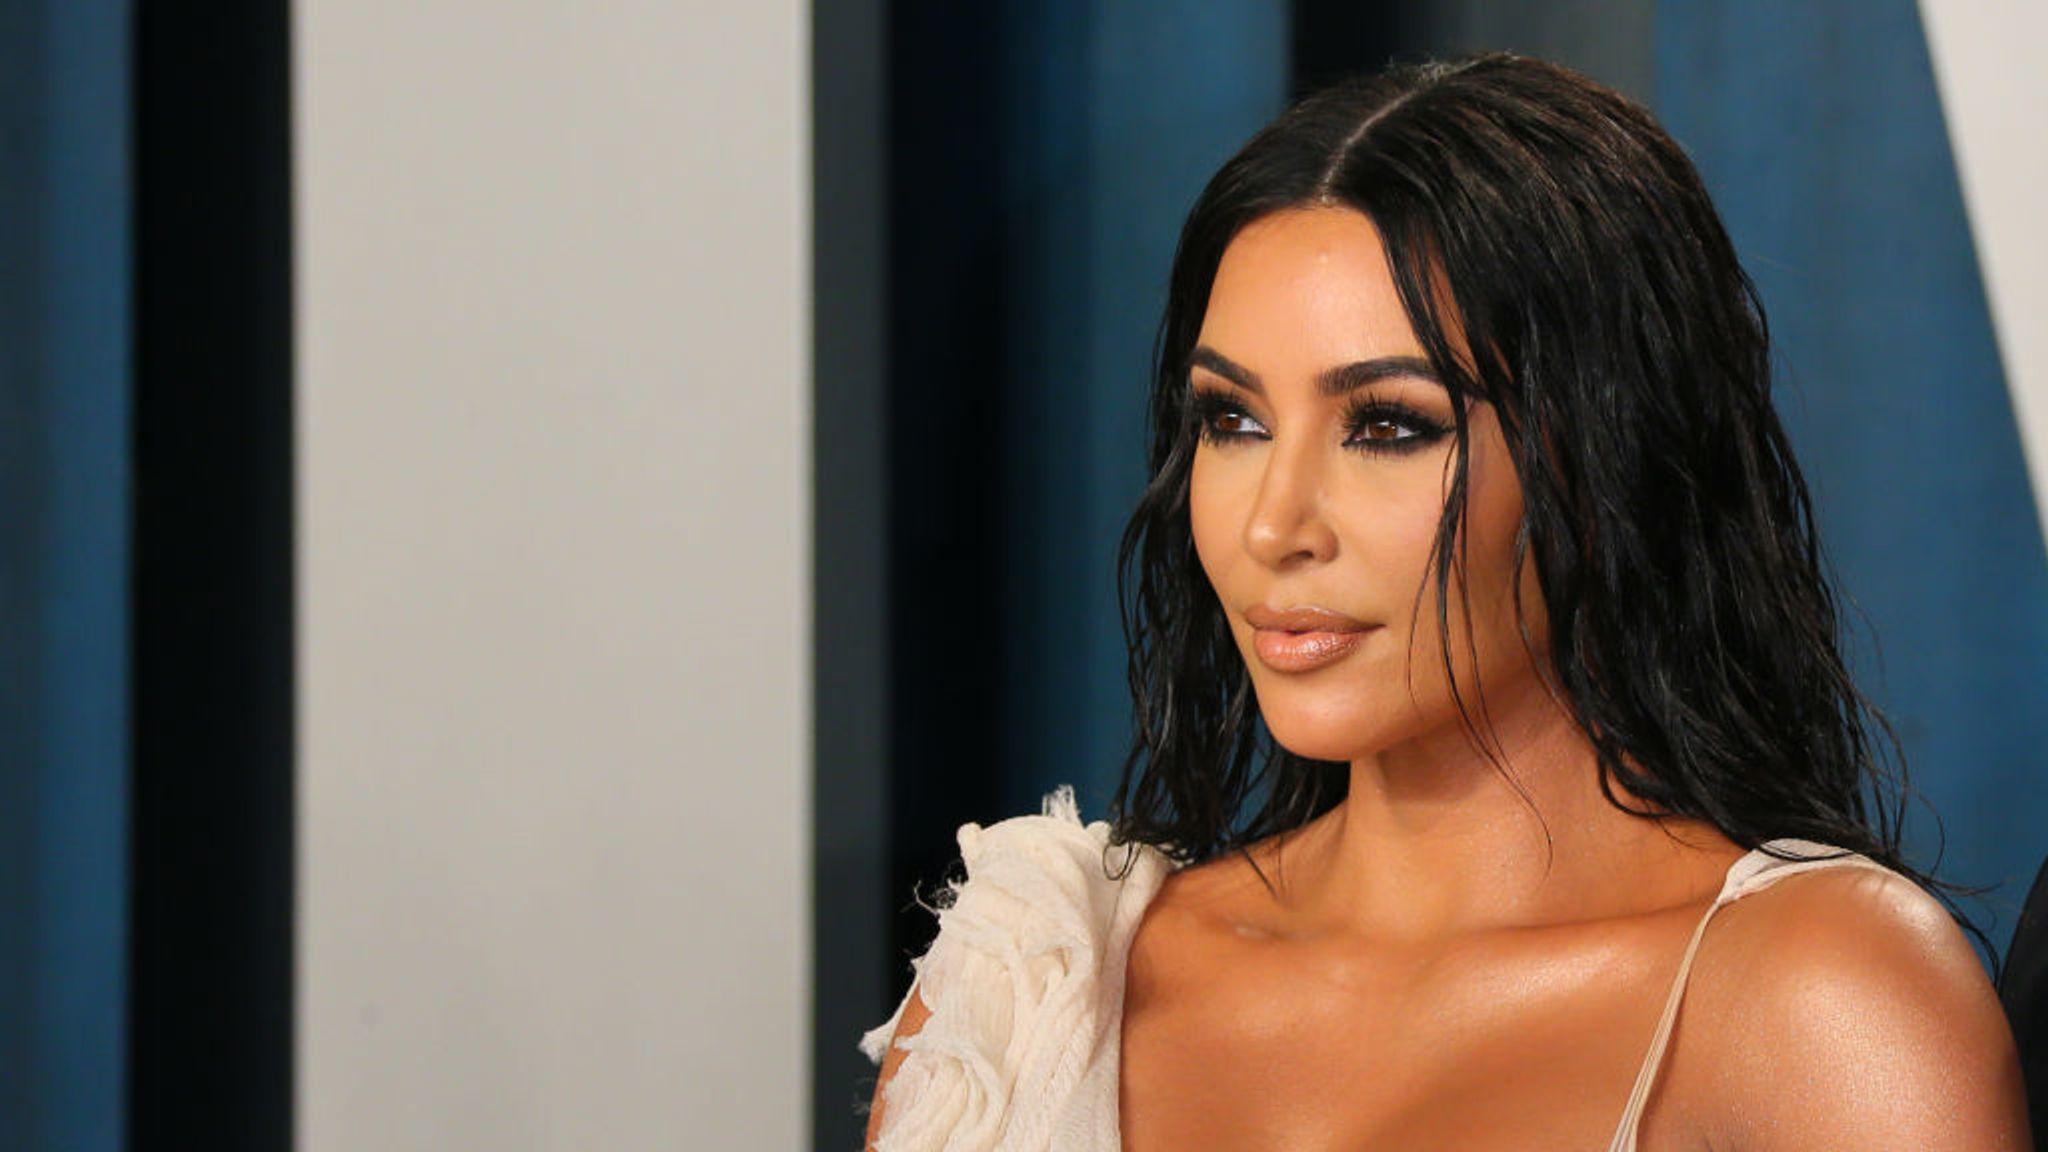 Kim Kardashian West Joins The Billionaires Club